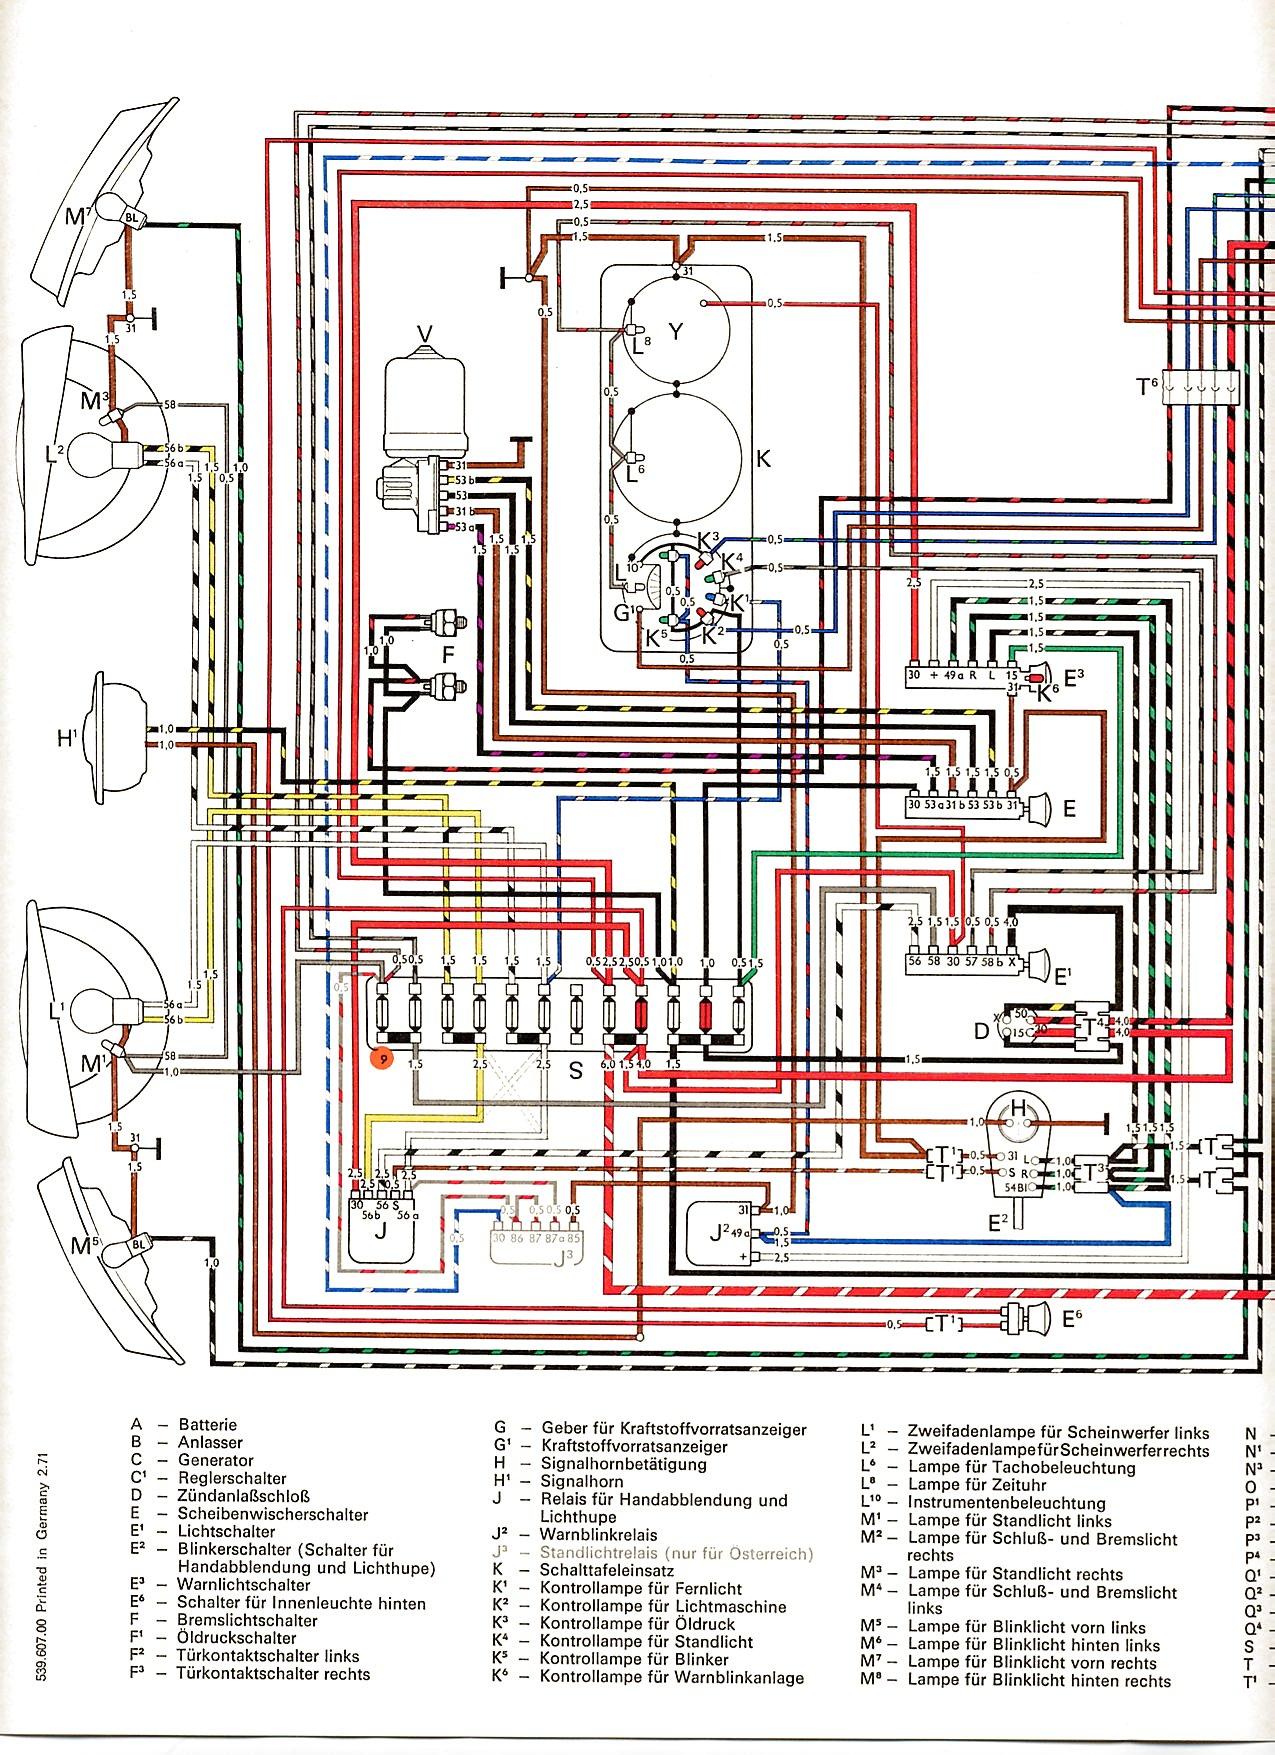 Remarkable Vw Wiring Diagrams Wiring Cloud Rometaidewilluminateatxorg